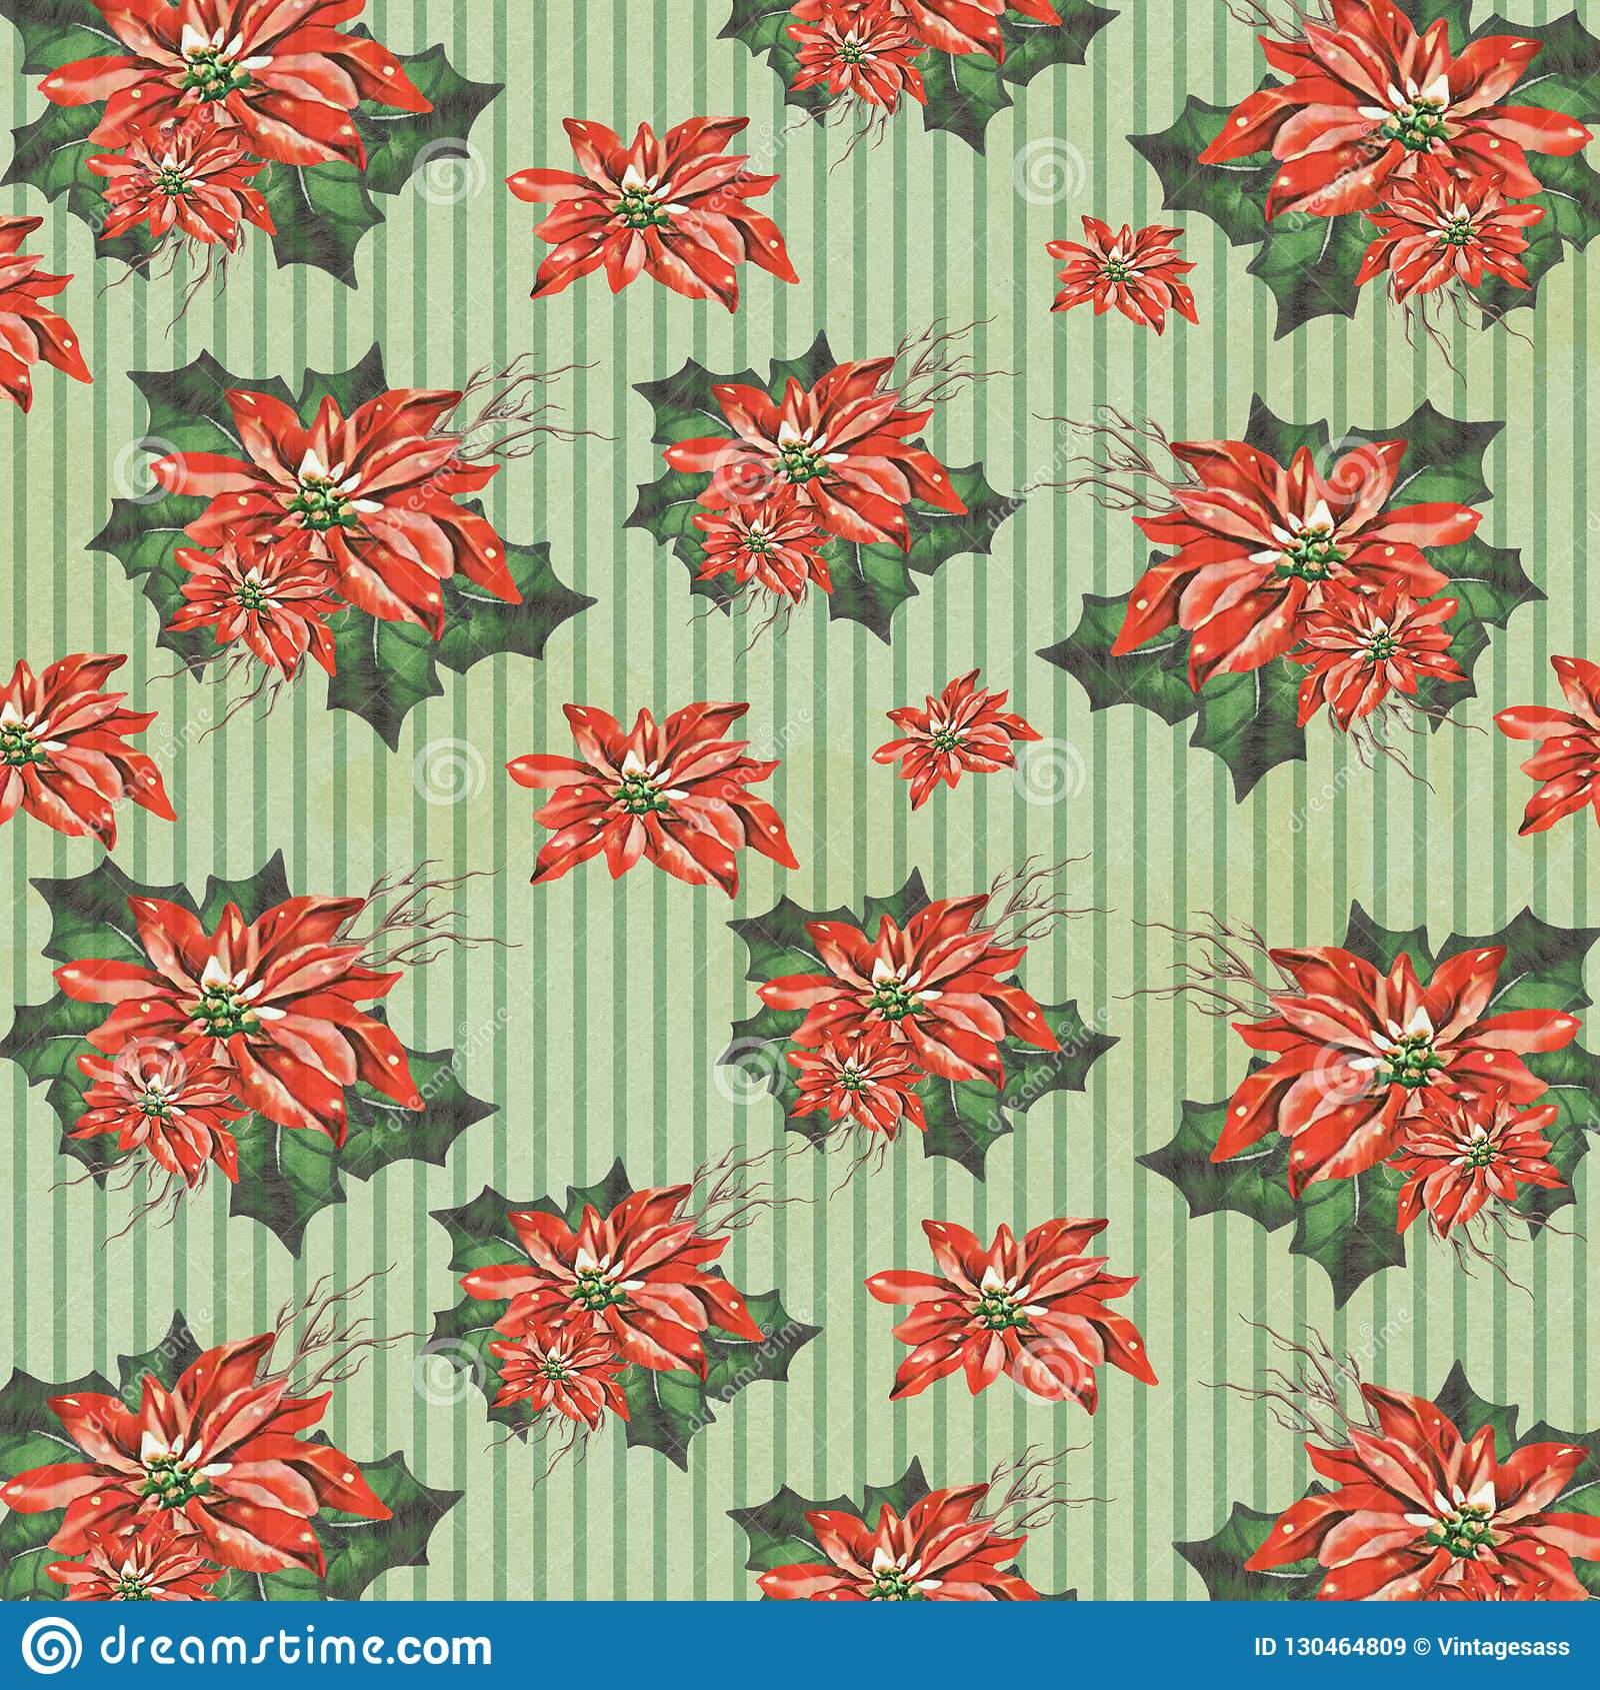 floral scrapbook paper crafts